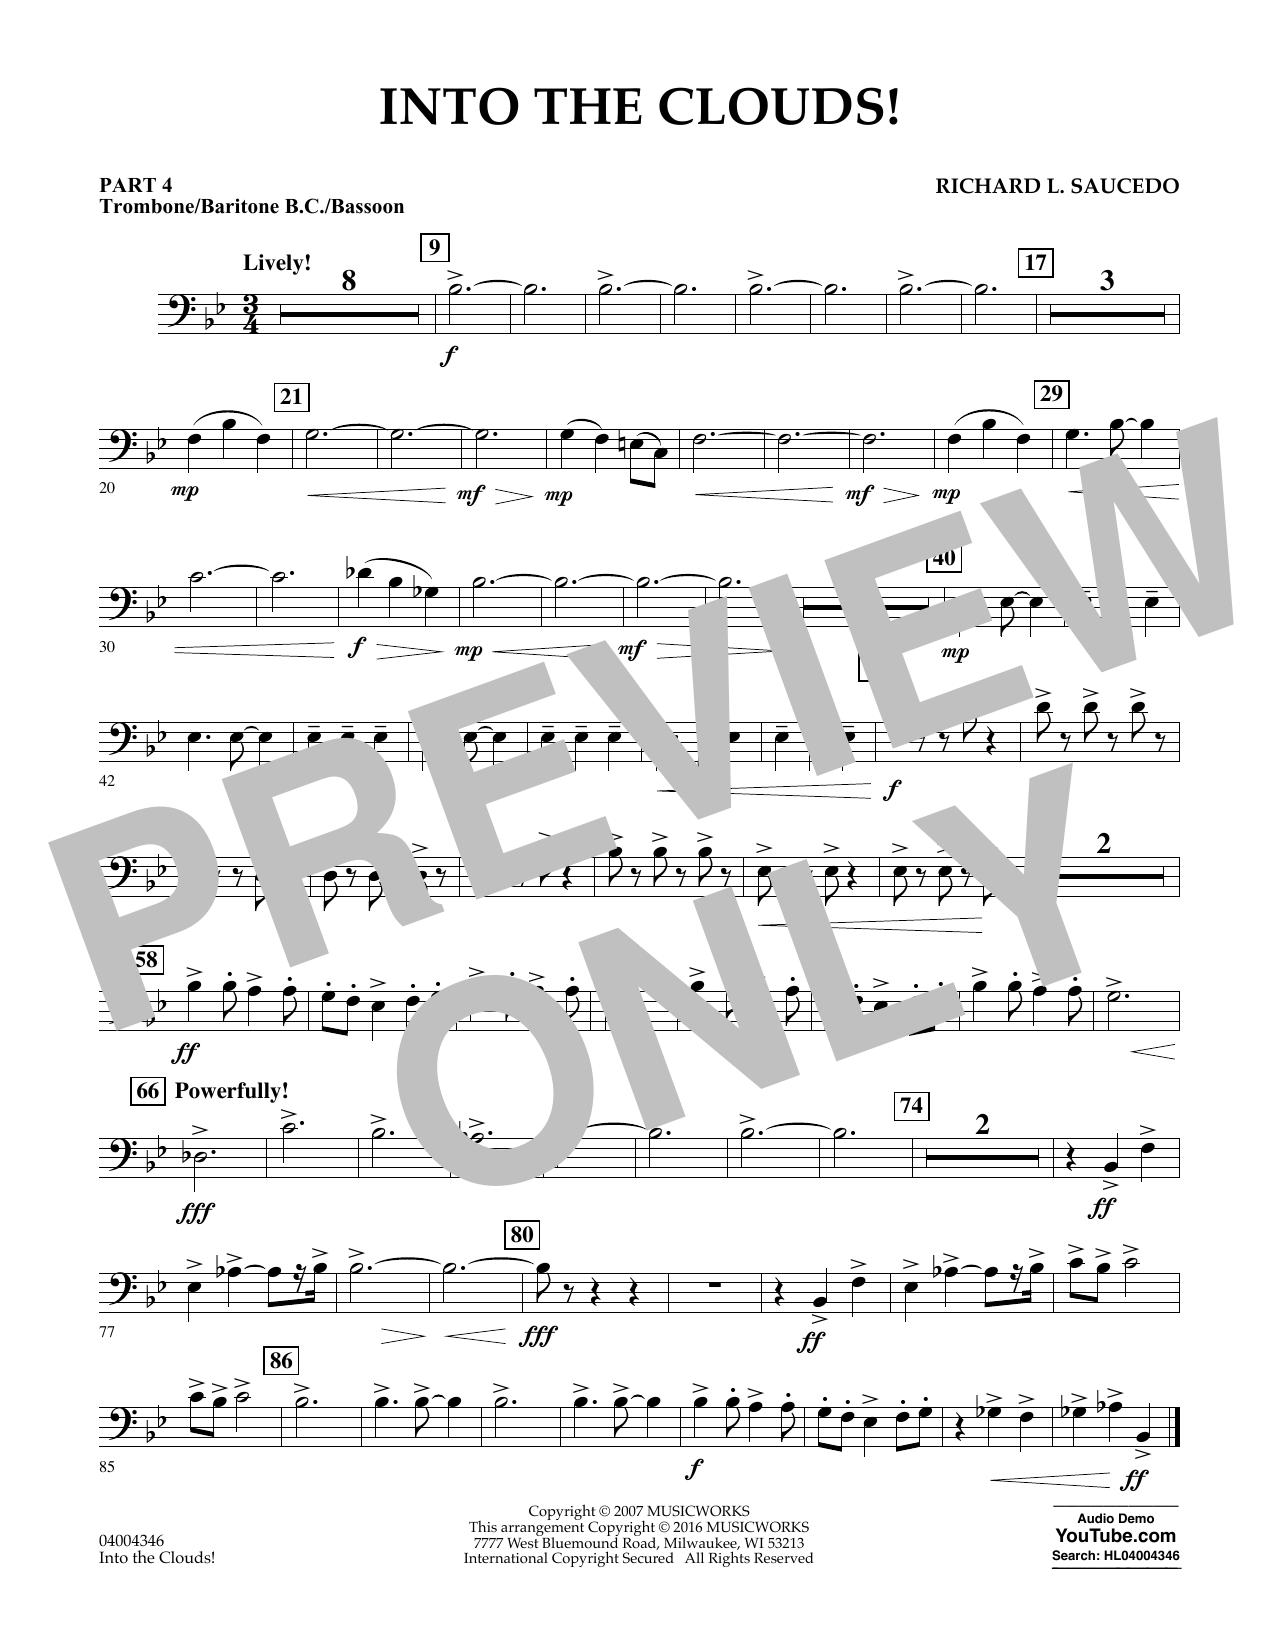 Into the Clouds! - Pt.4 - Trombone/Bar. B.C./Bsn. (Flex-Band)